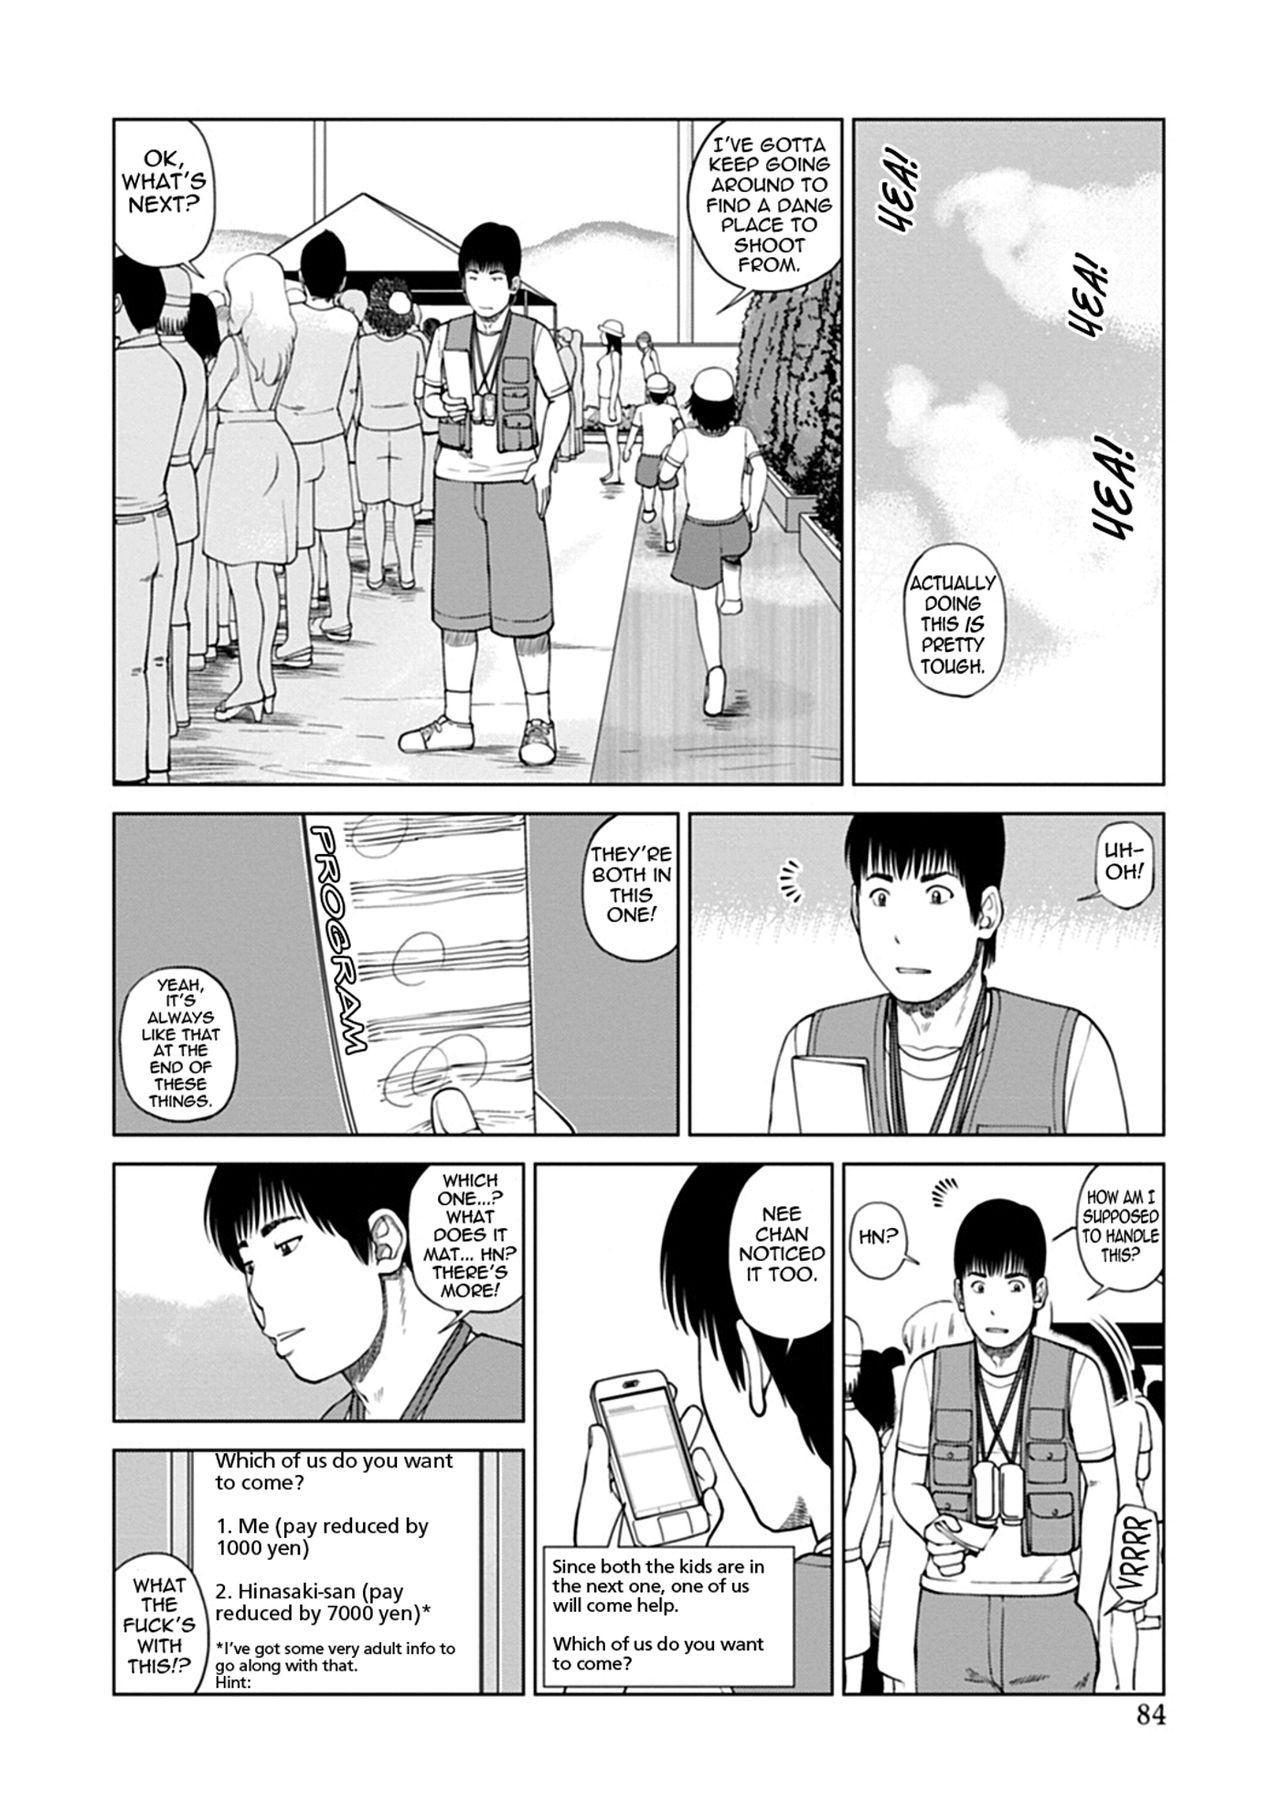 [Kuroki Hidehiko] 36-sai Injuku Sakarizuma | 36-Year-Old Randy Mature Wife [English] {Tadanohito} [Digital] [Uncensored] 80